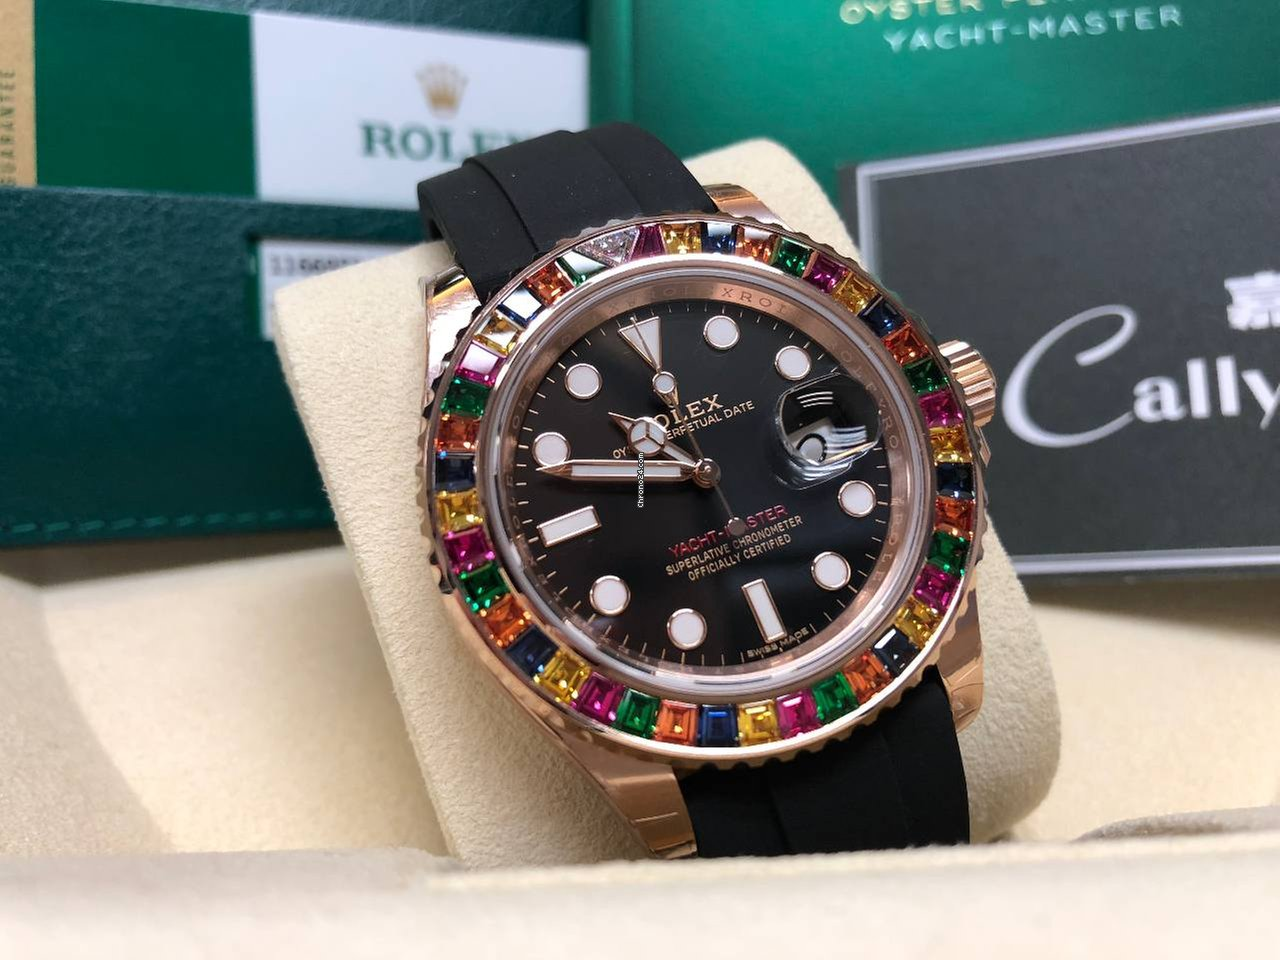 Rolex Cally 116695 SATS Yacht Master Rainbow Bezel For